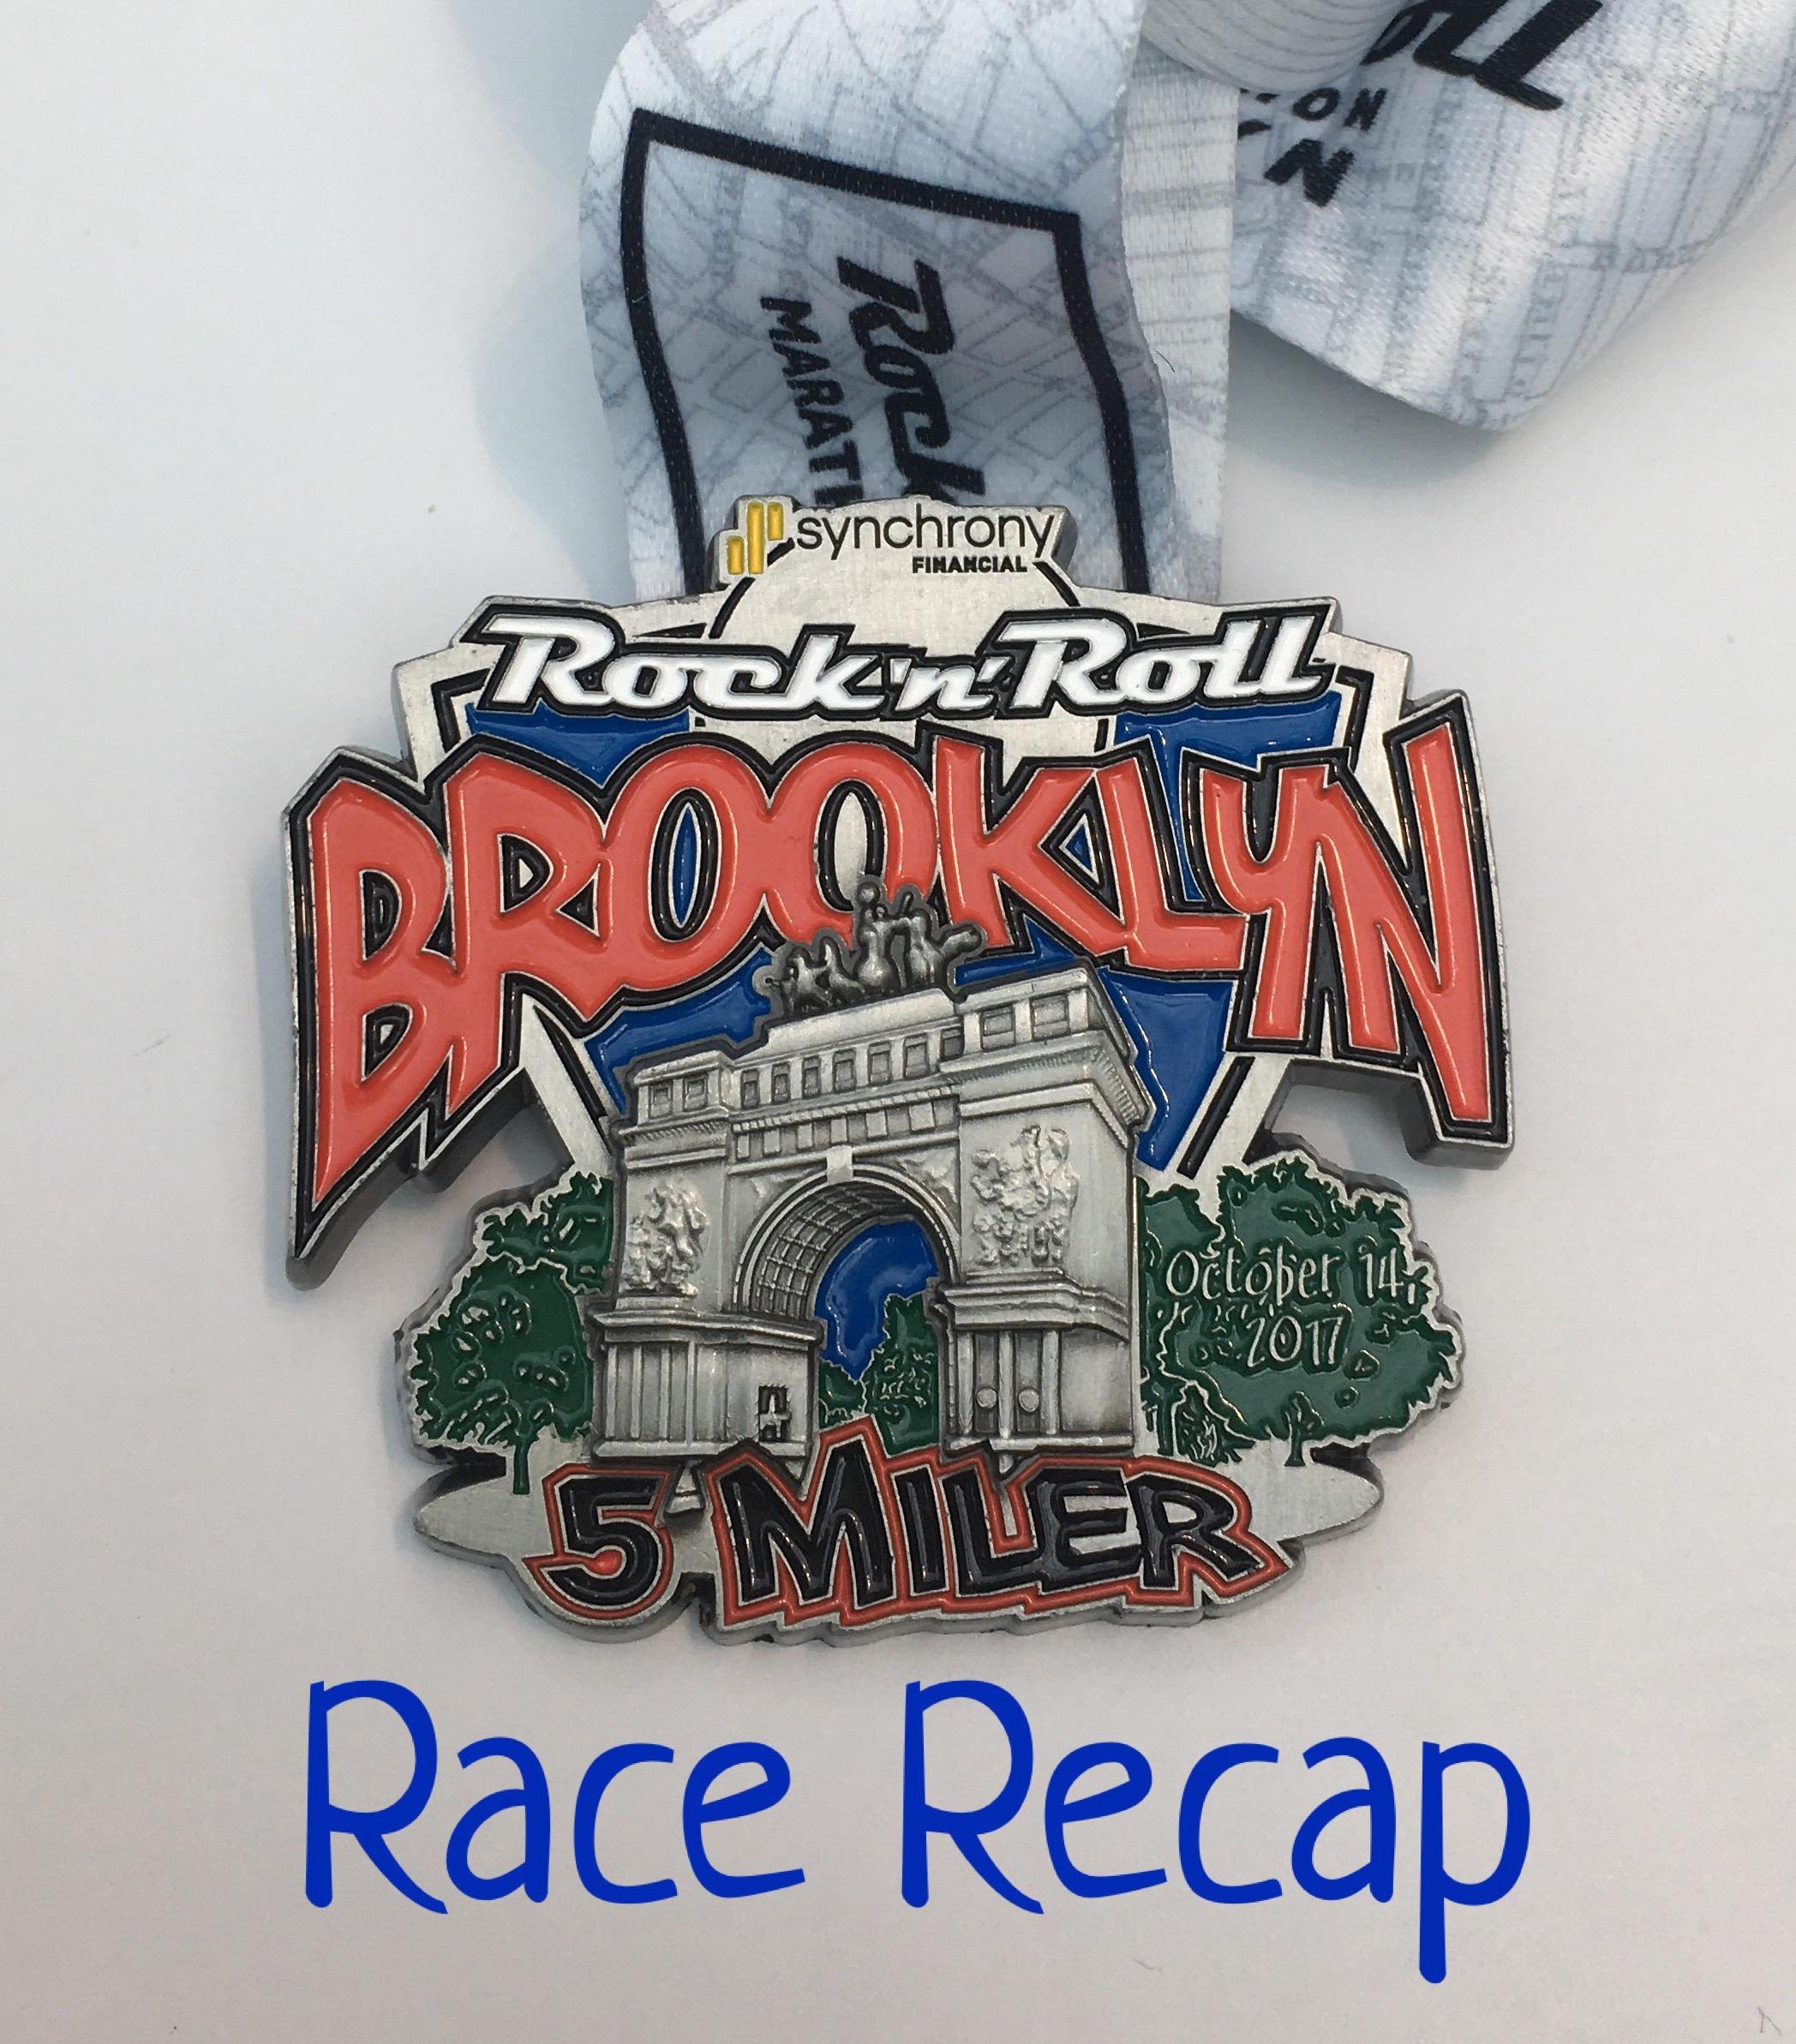 Rock 'n' Roll Brooklyn 5 Miler Race Recap